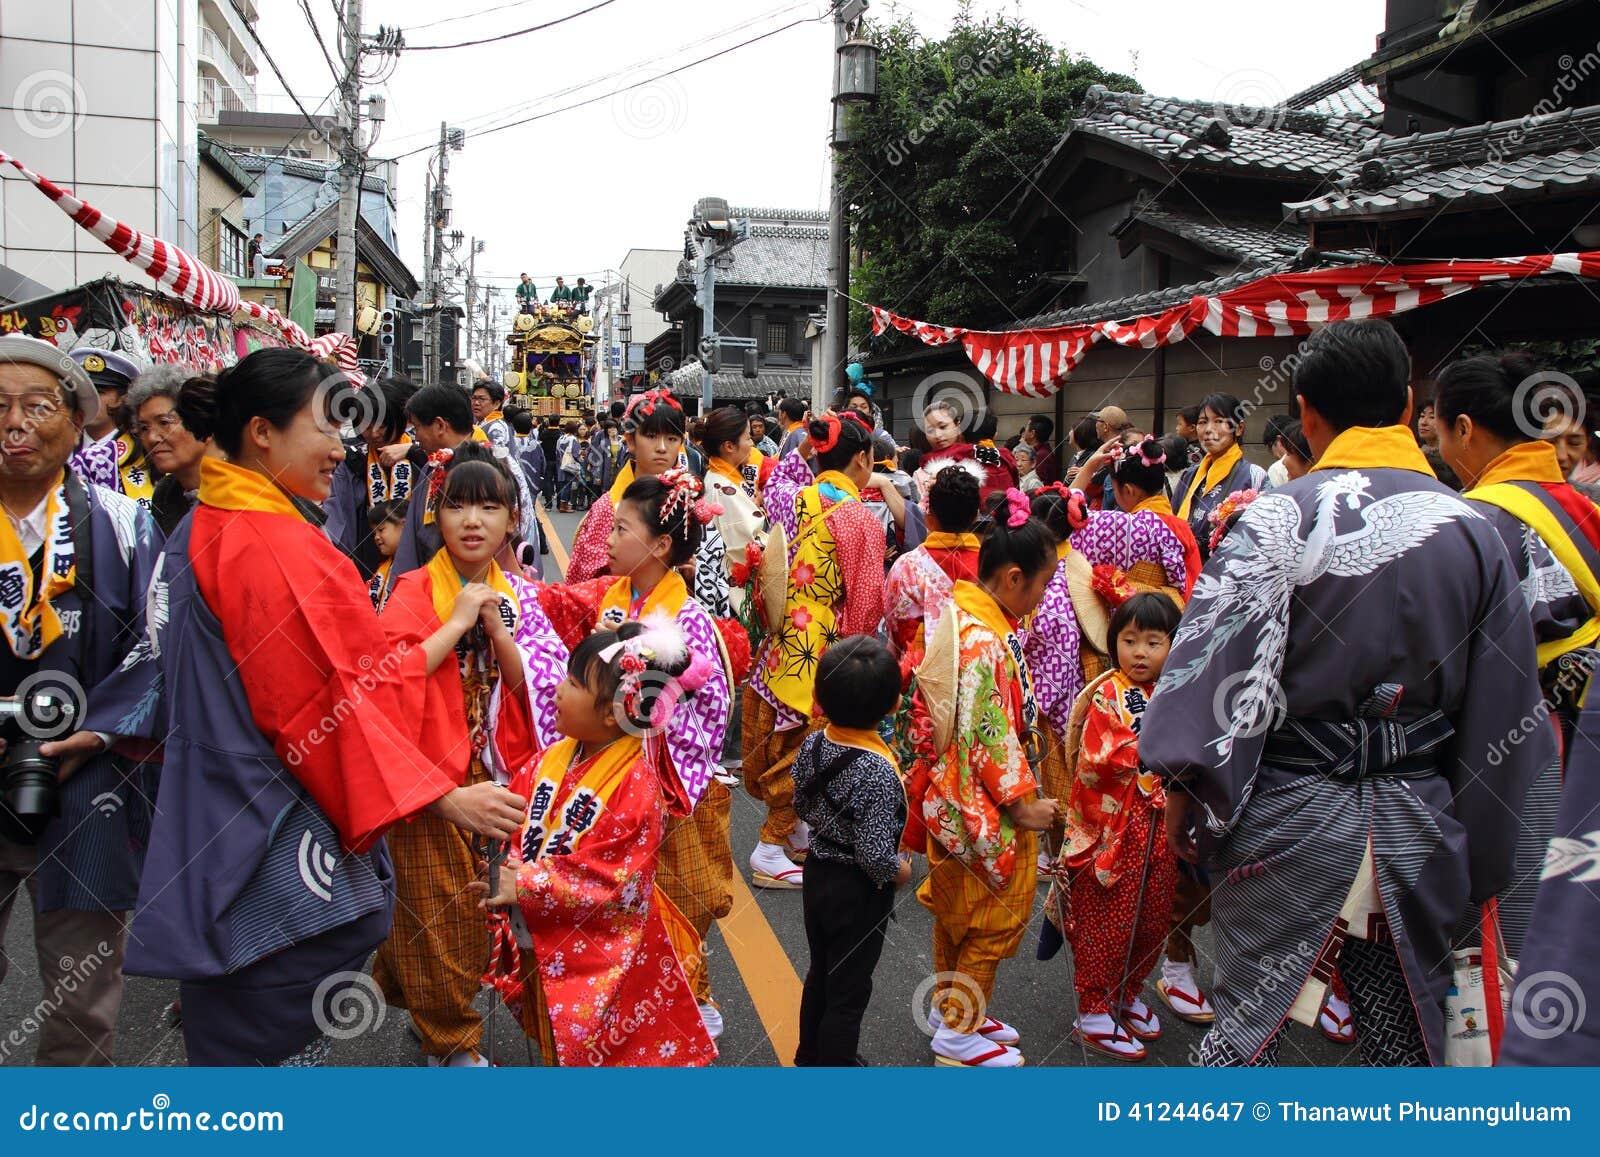 Kawagoe Festival On Oct 19 2013 In Kawagoe Editorial Photography - Image: 41244647